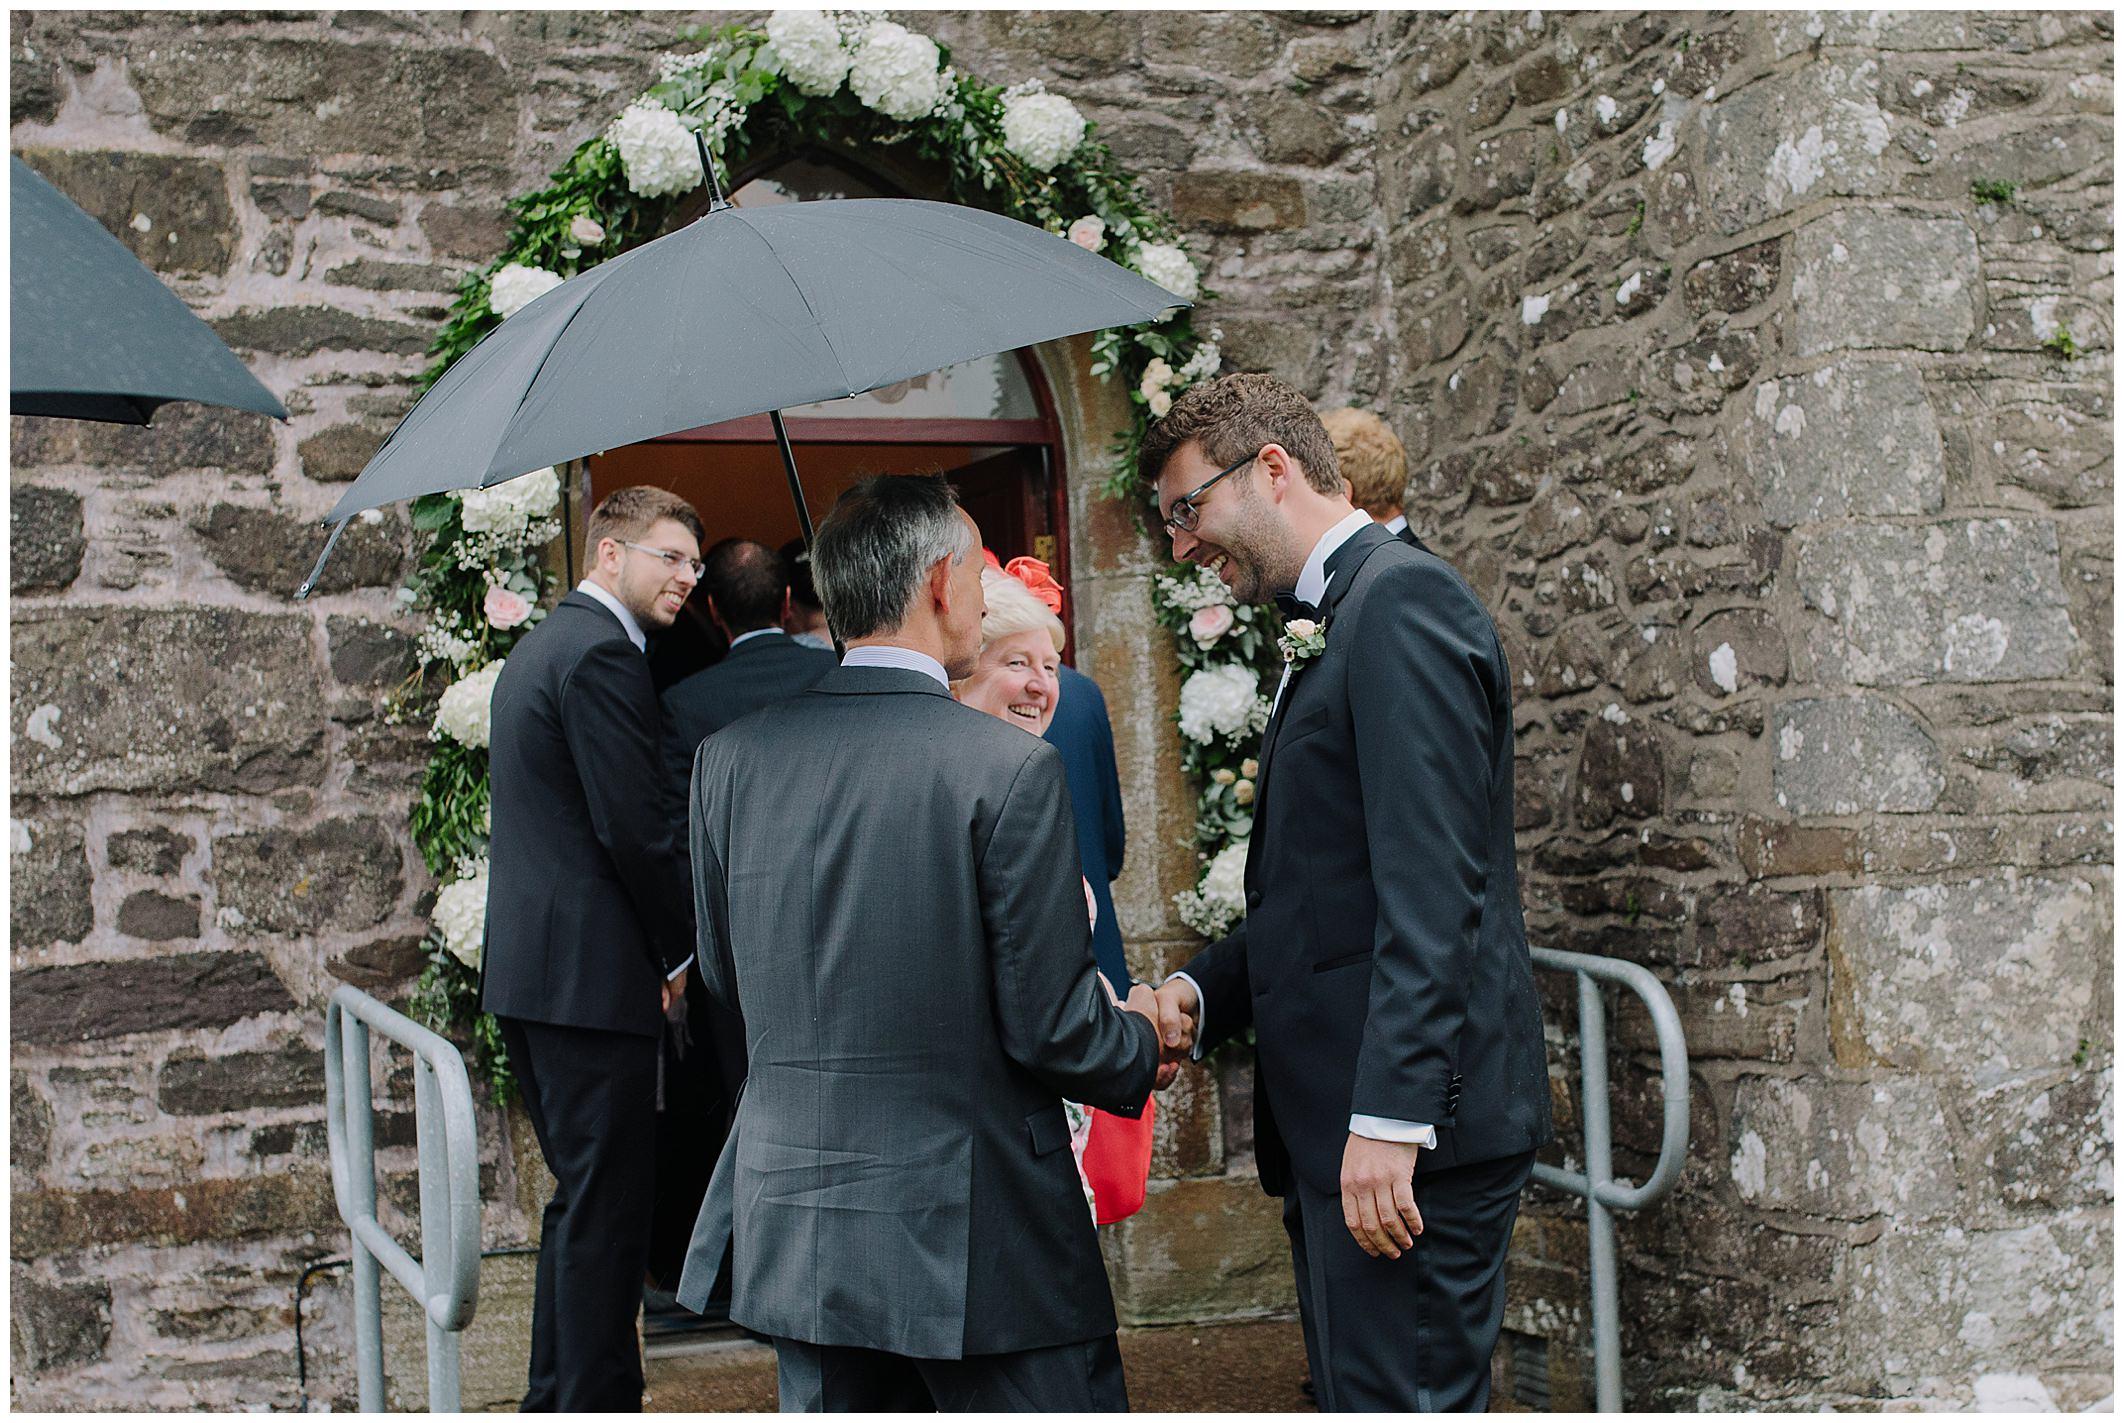 farnham-estate-wedding-jude-browne-photography_0069.jpg